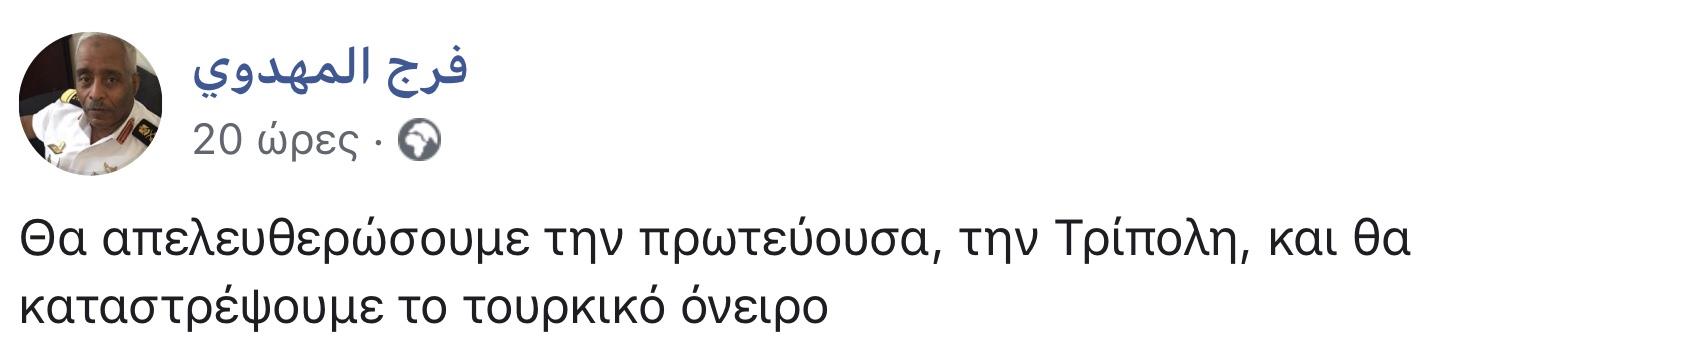 img 2292